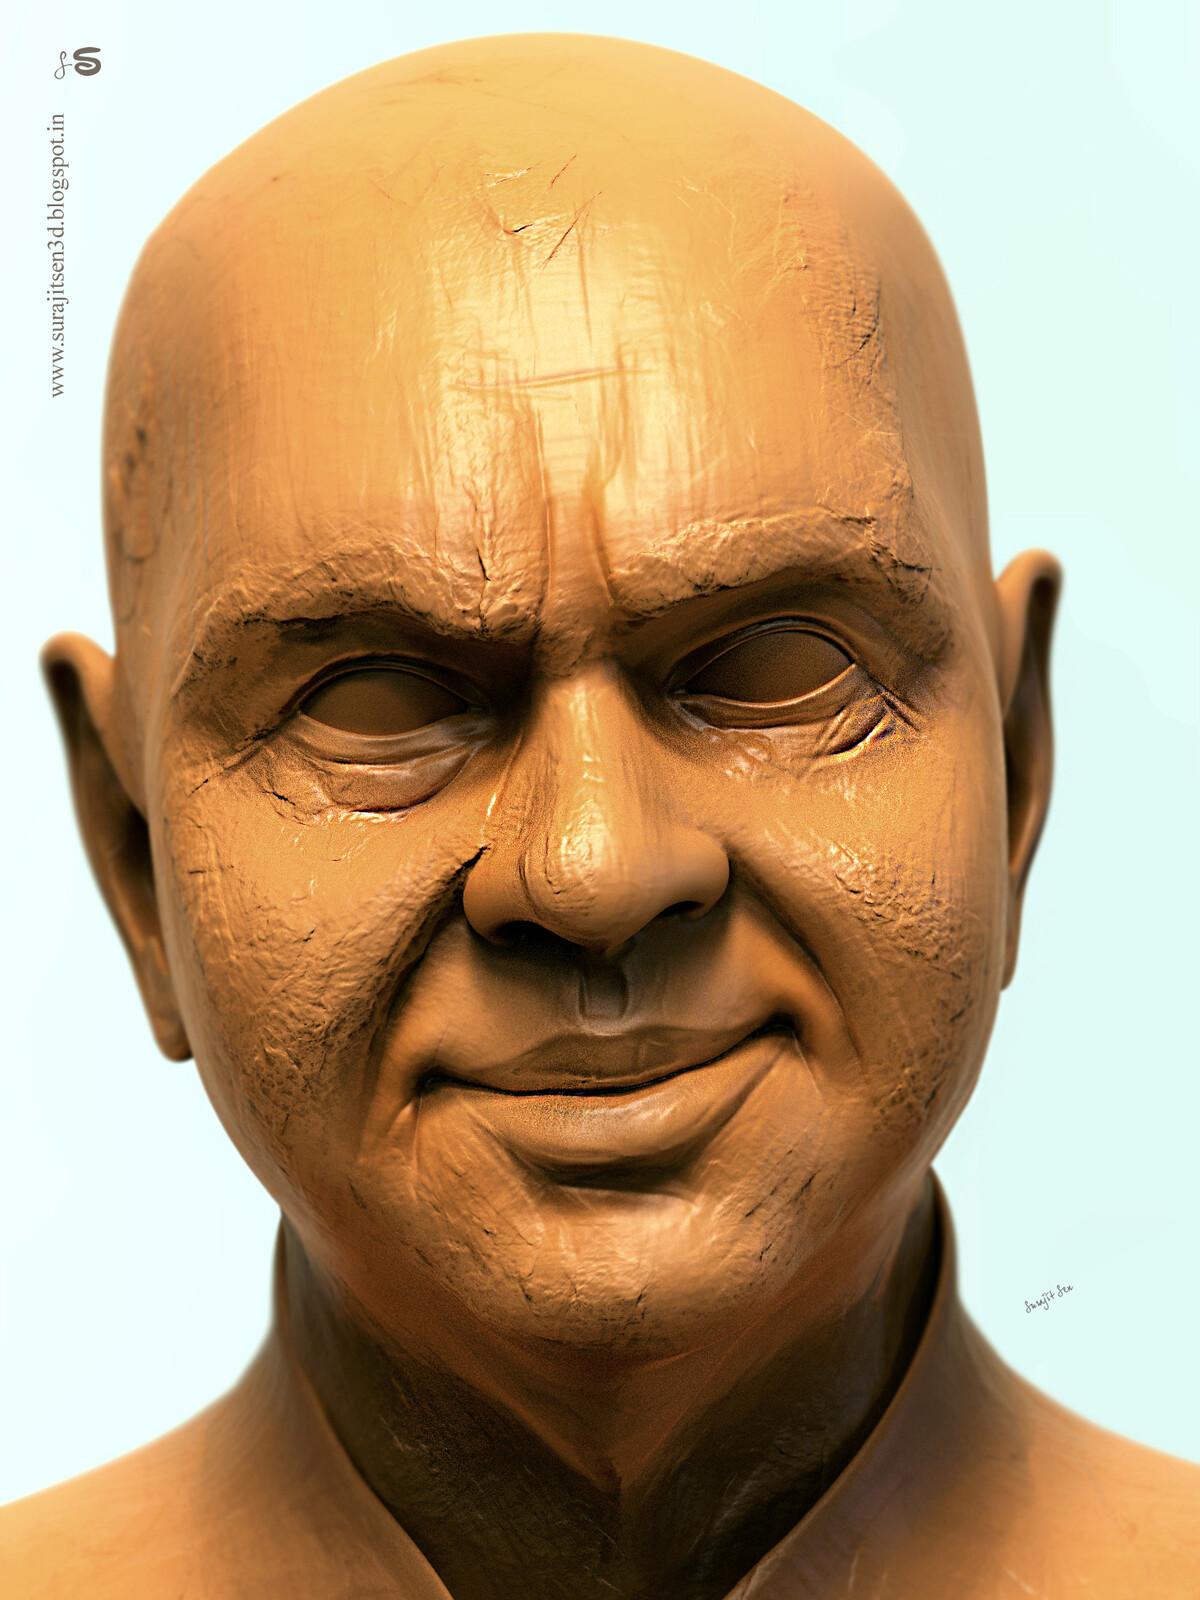 "#doodle #quicksculpt #study ""Mr_Ghatak""....wish to share my speed Digital sculpt study!"